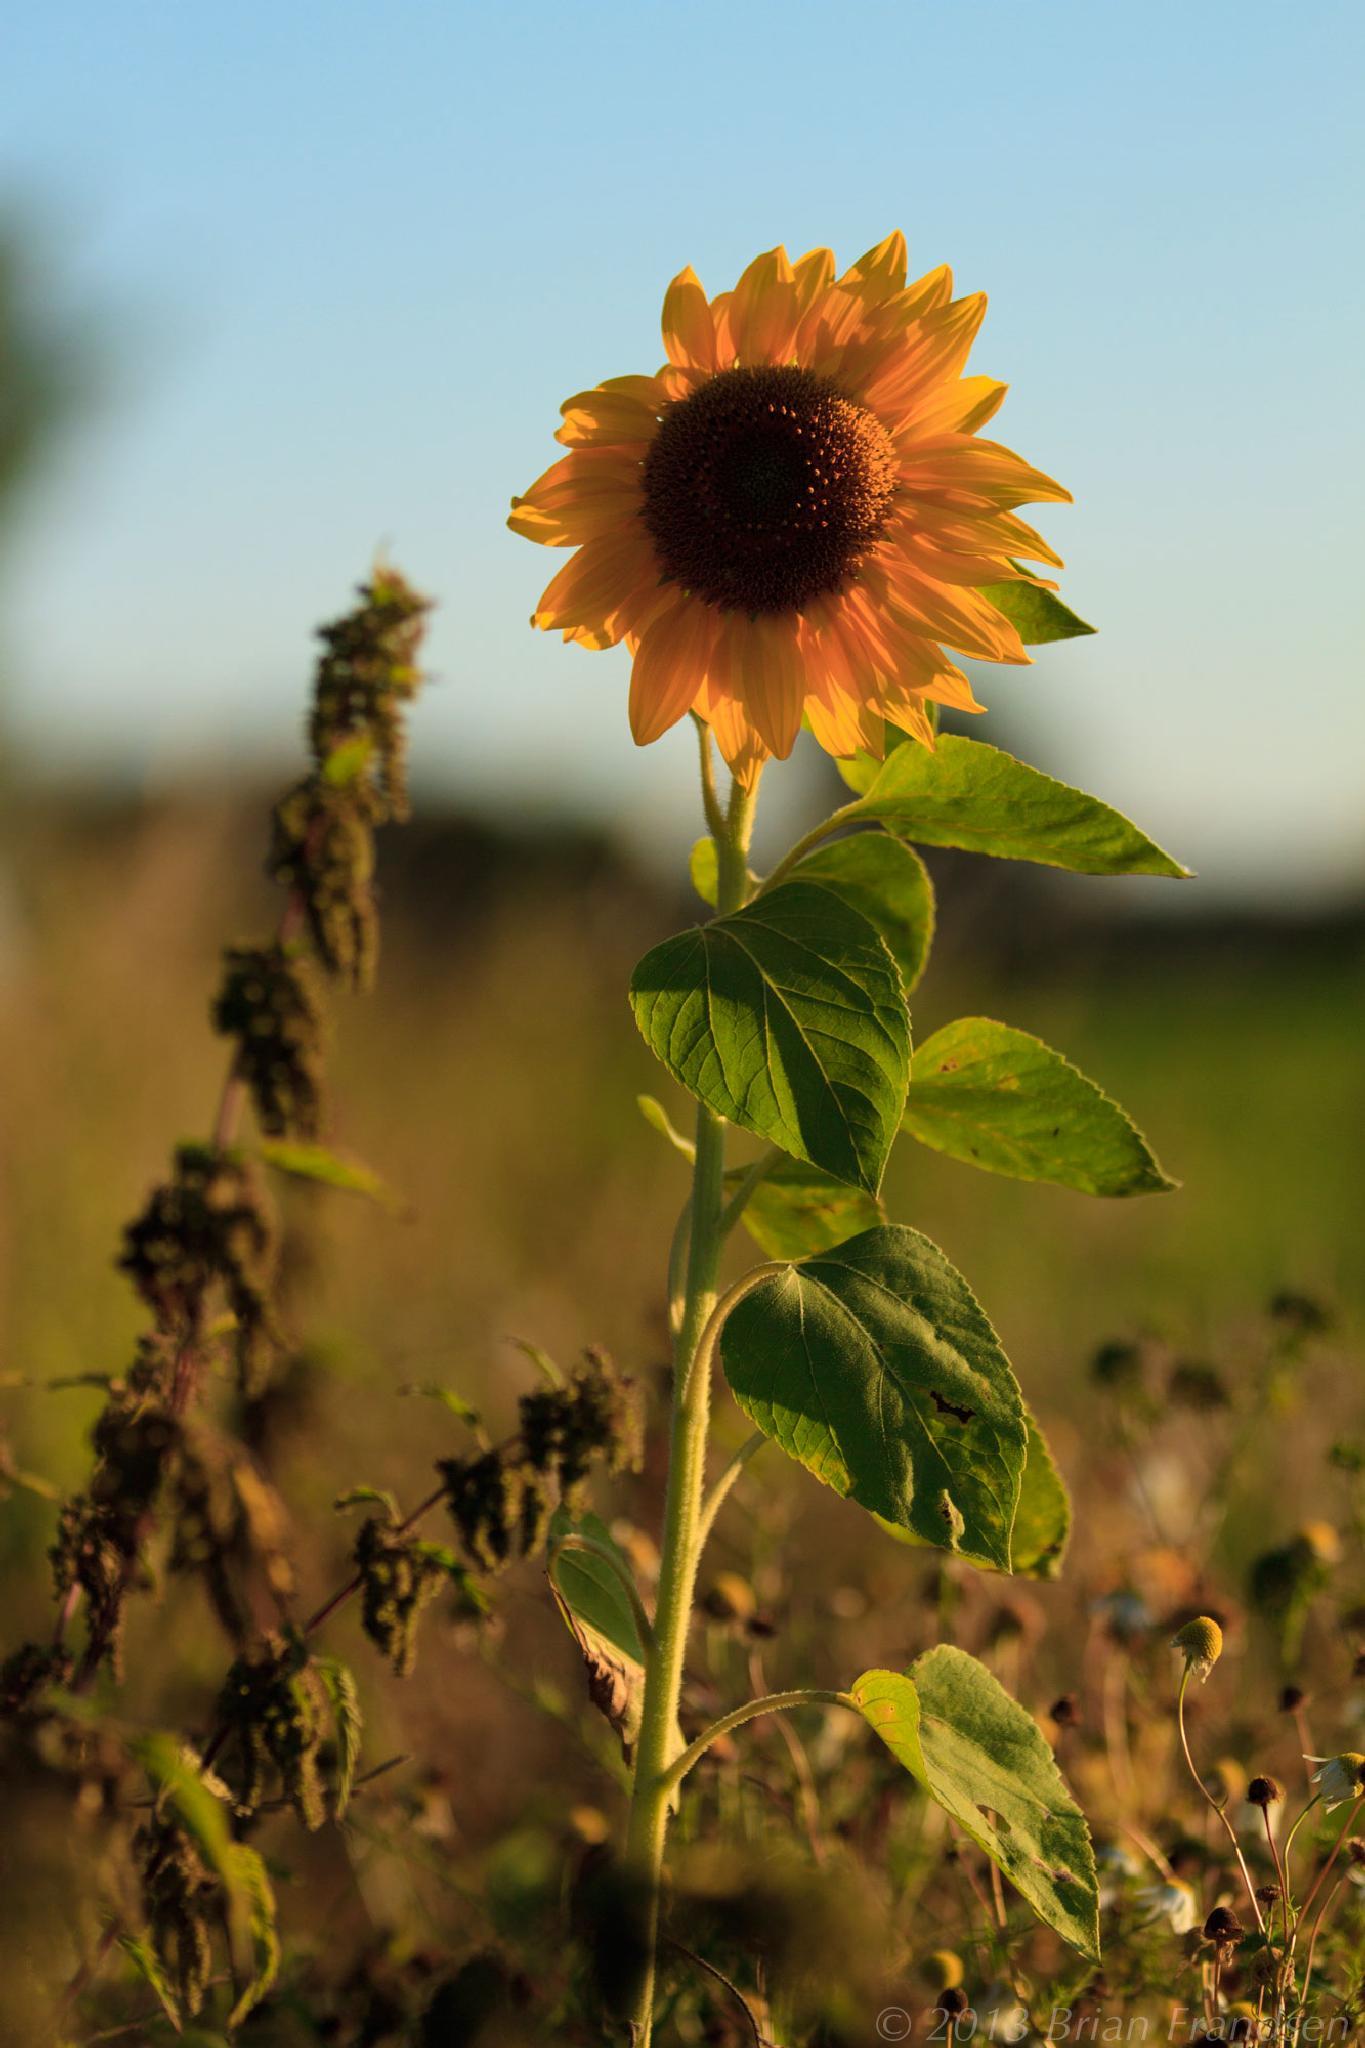 Last flower standing by Brian Frandsen